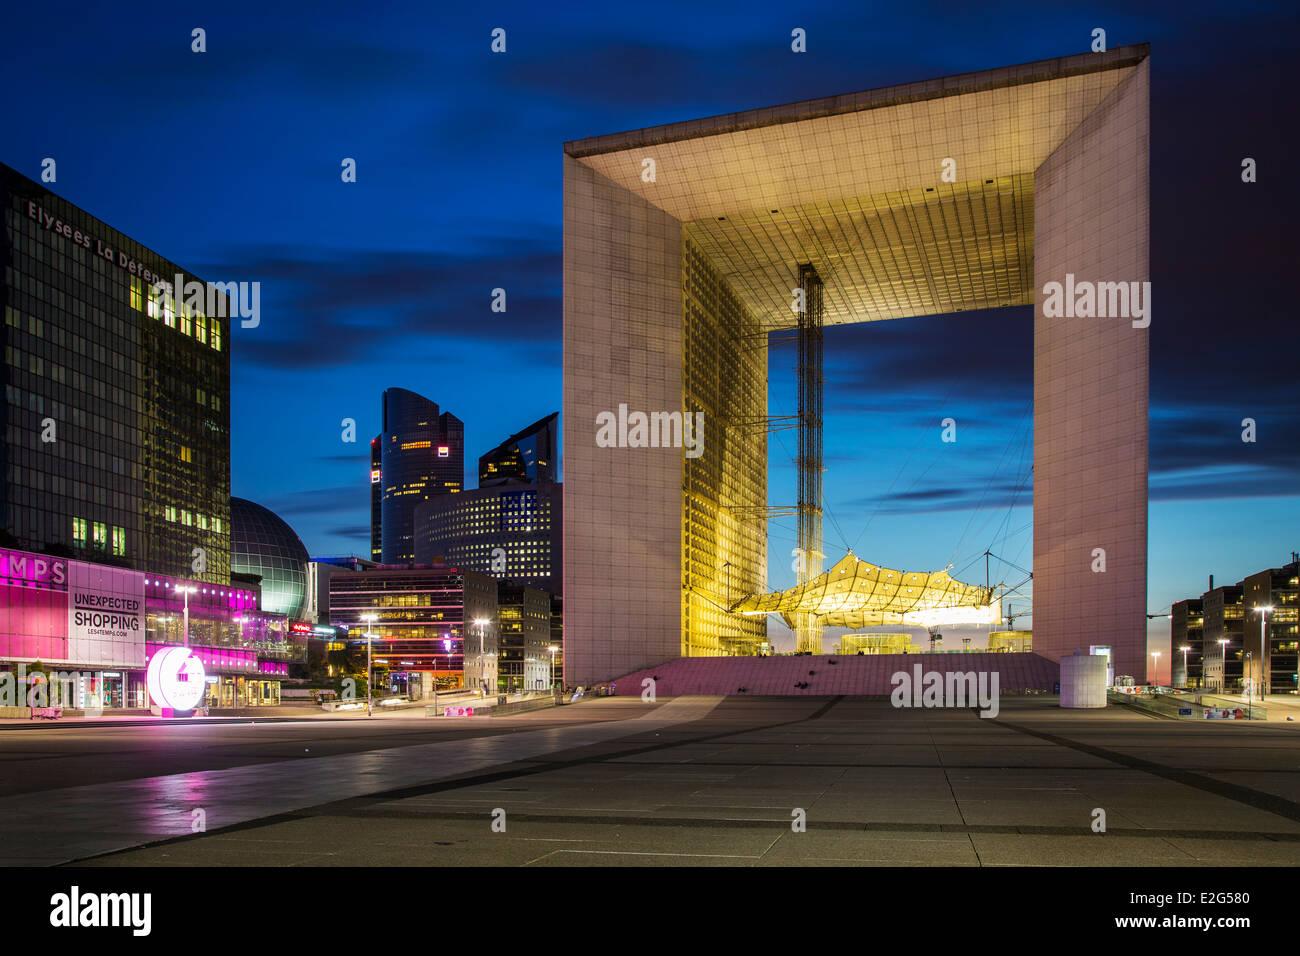 La Grande Arche de la Defense, and the modern buildings of La Defense district, Paris France Stock Photo